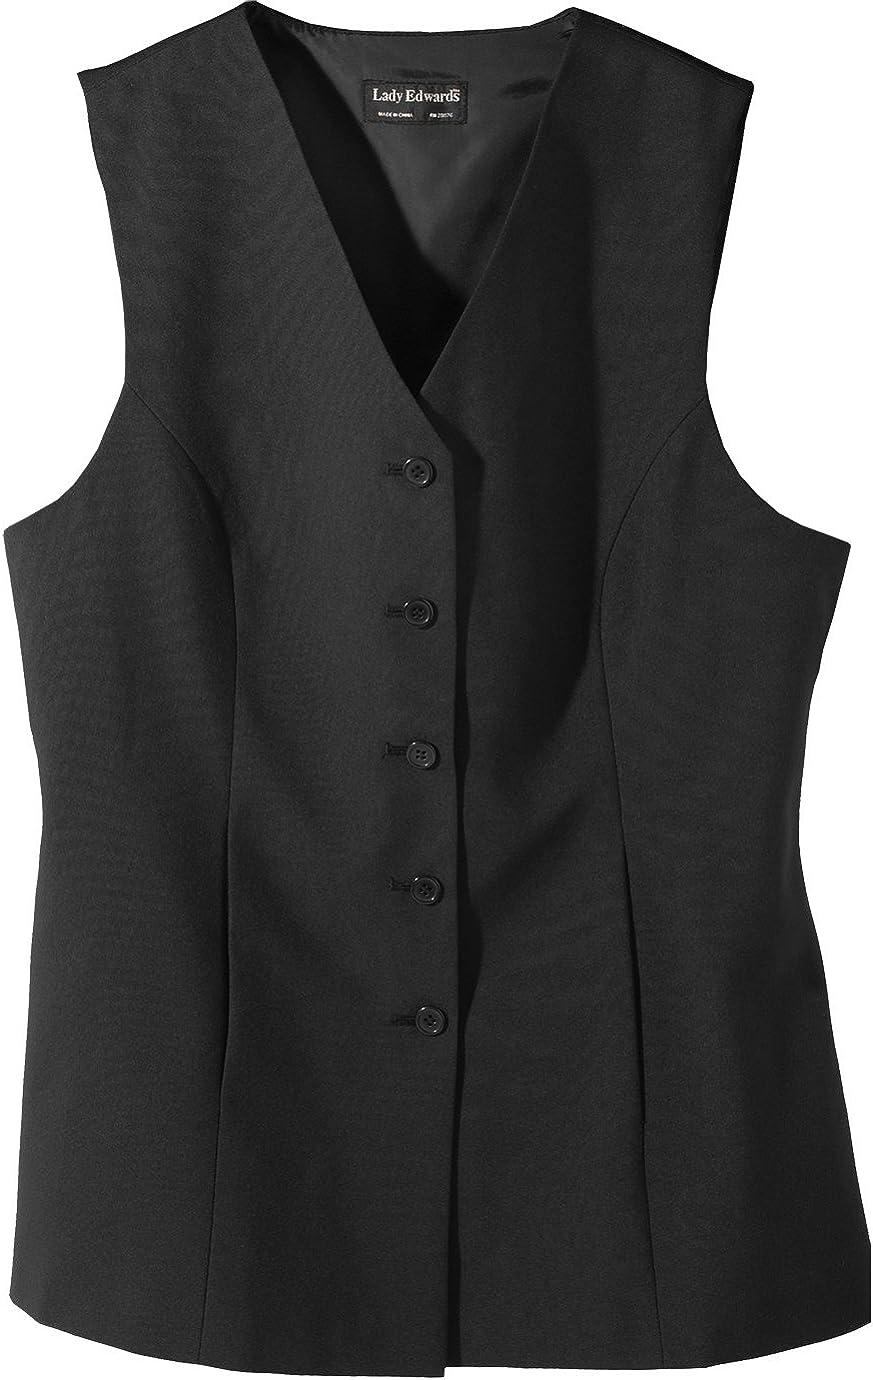 Department store New item Edwards Ladies' Tunic Economy